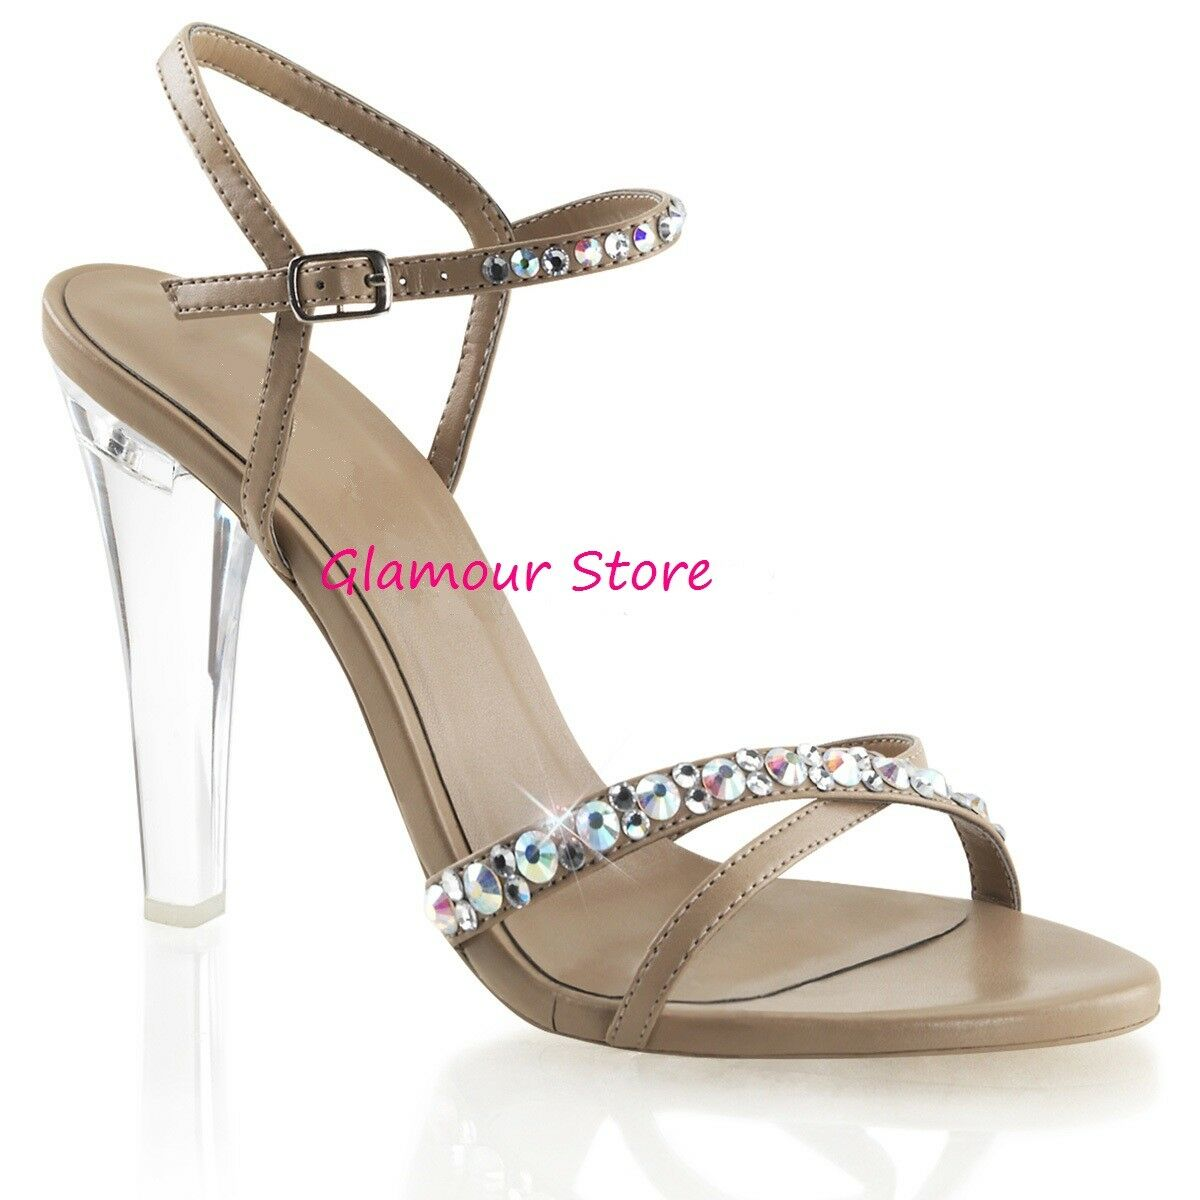 Sexy SANDALI STRASS tacco 11,5 dal 35 al 42 TORTORA/TRASPARENTE scarpe GLAMOUR